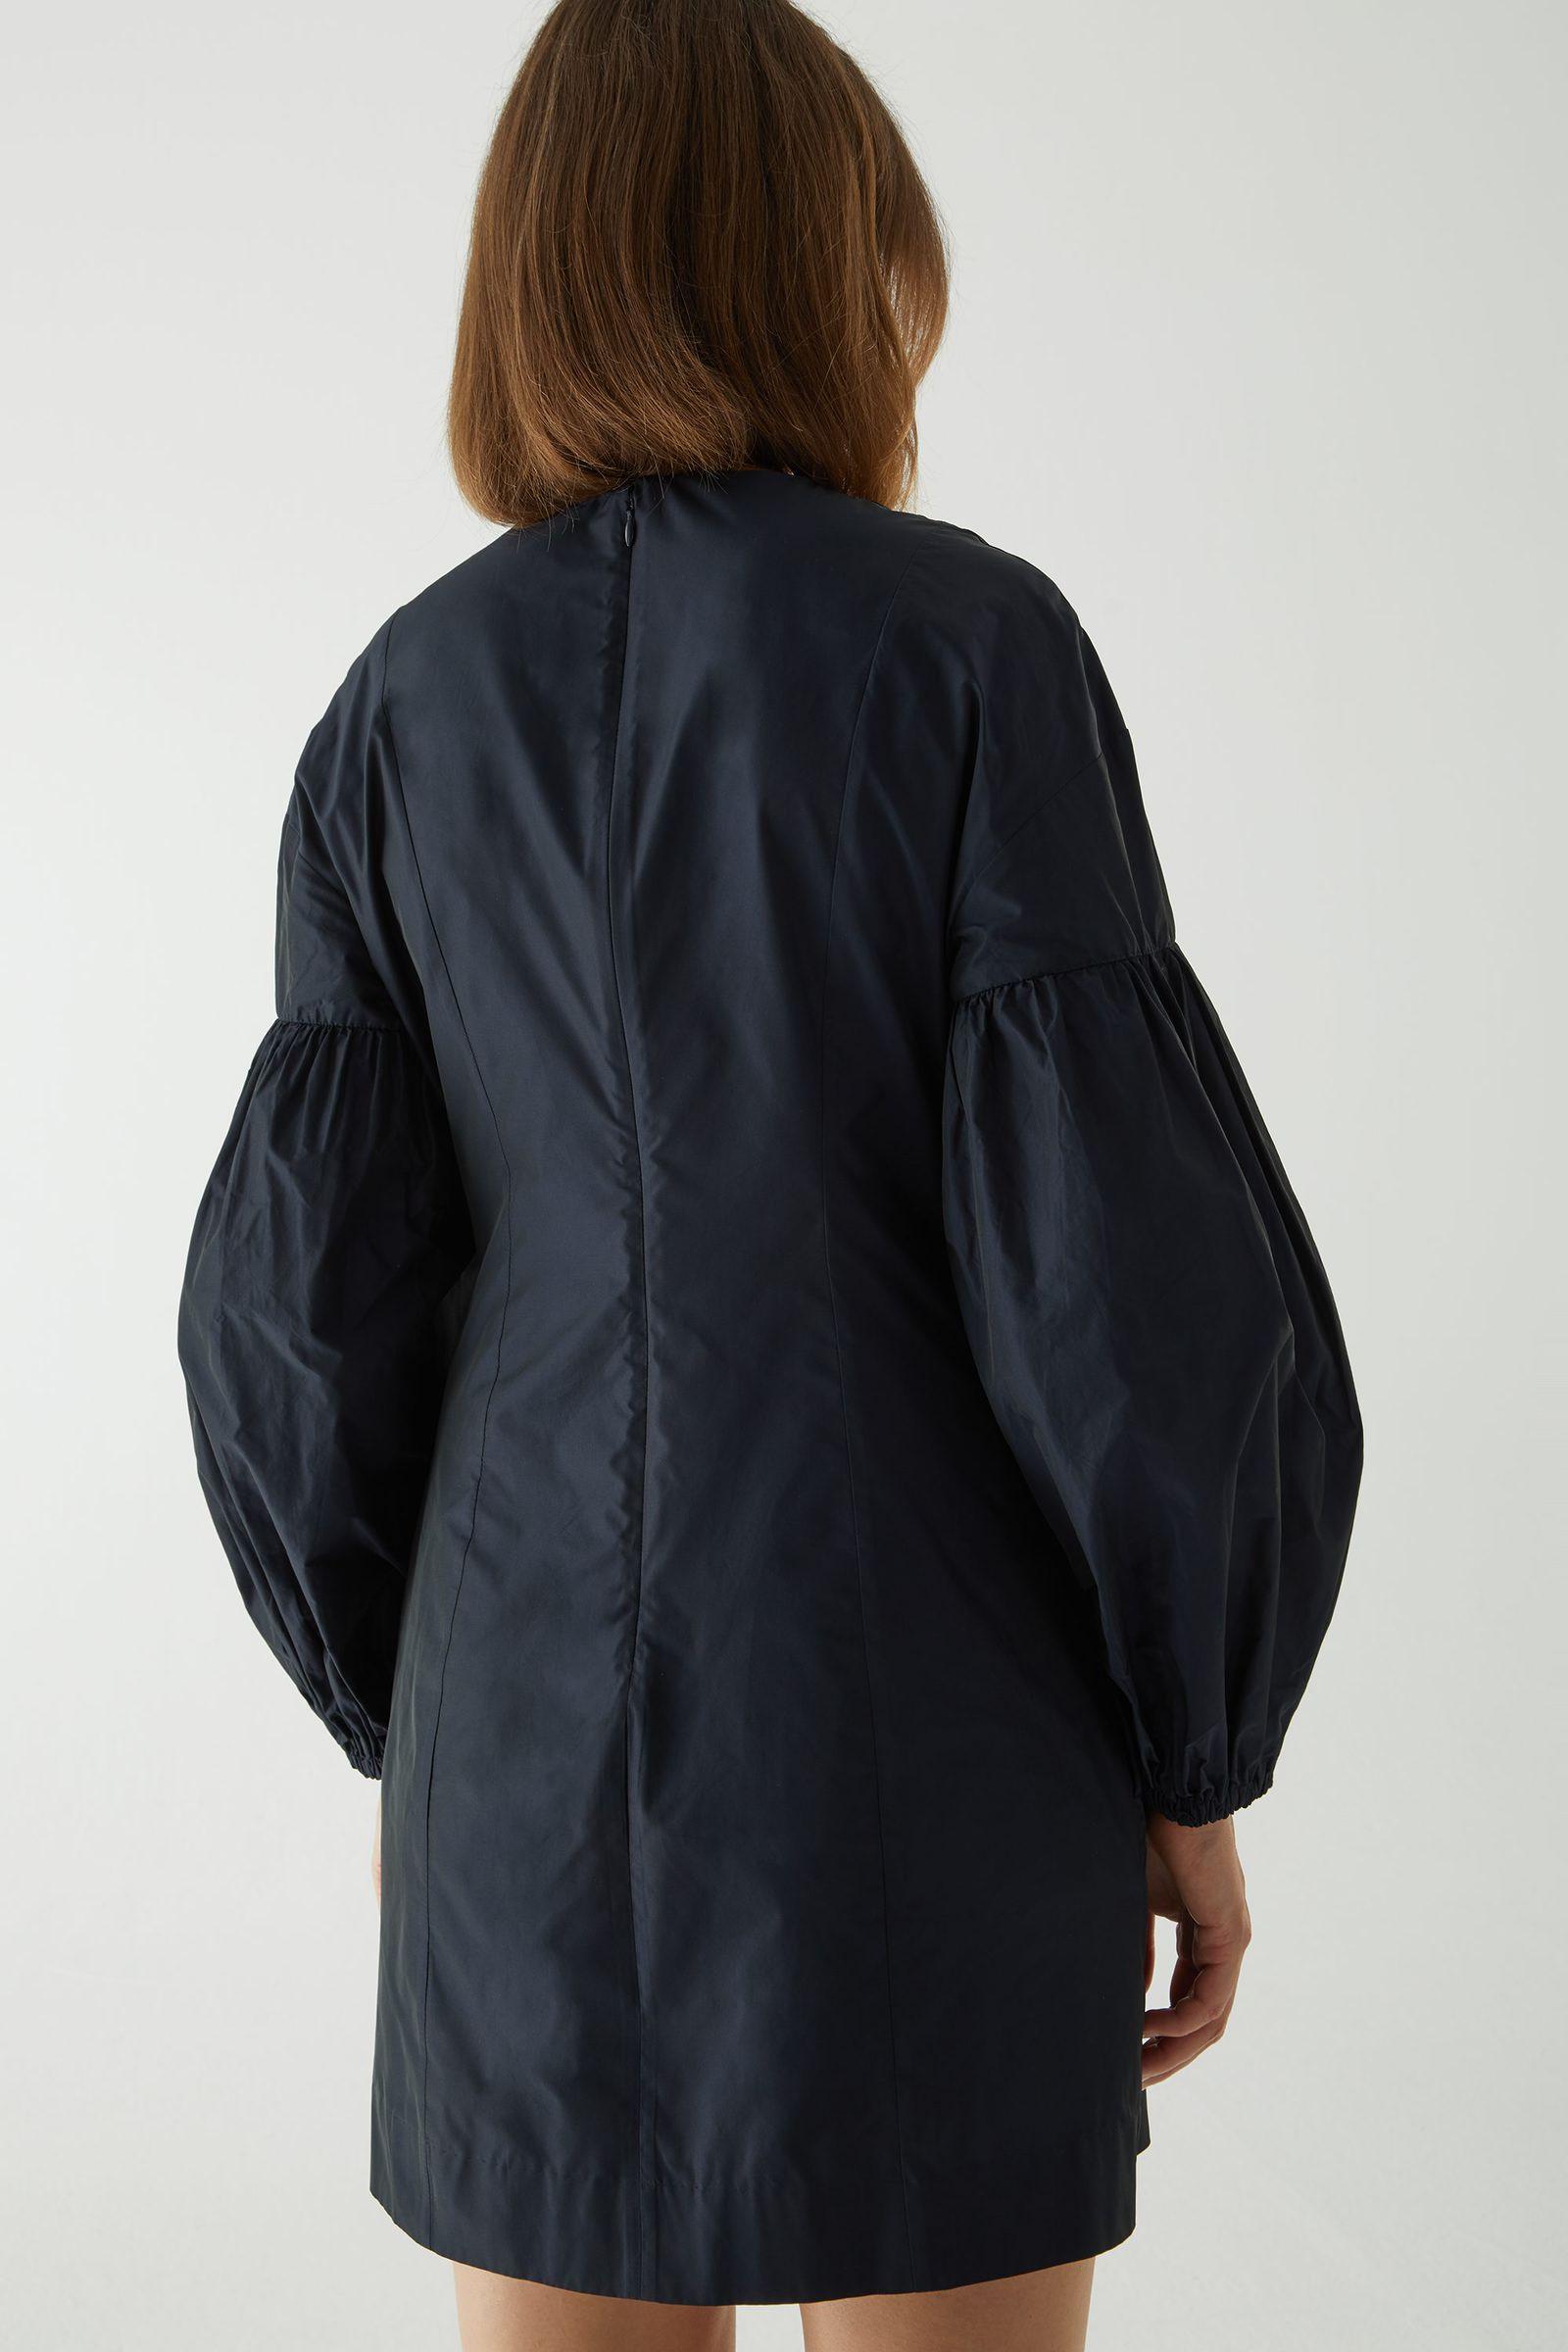 COS 볼륨 슬리브 웨이스트 드레스의 네이비컬러 ECOMLook입니다.